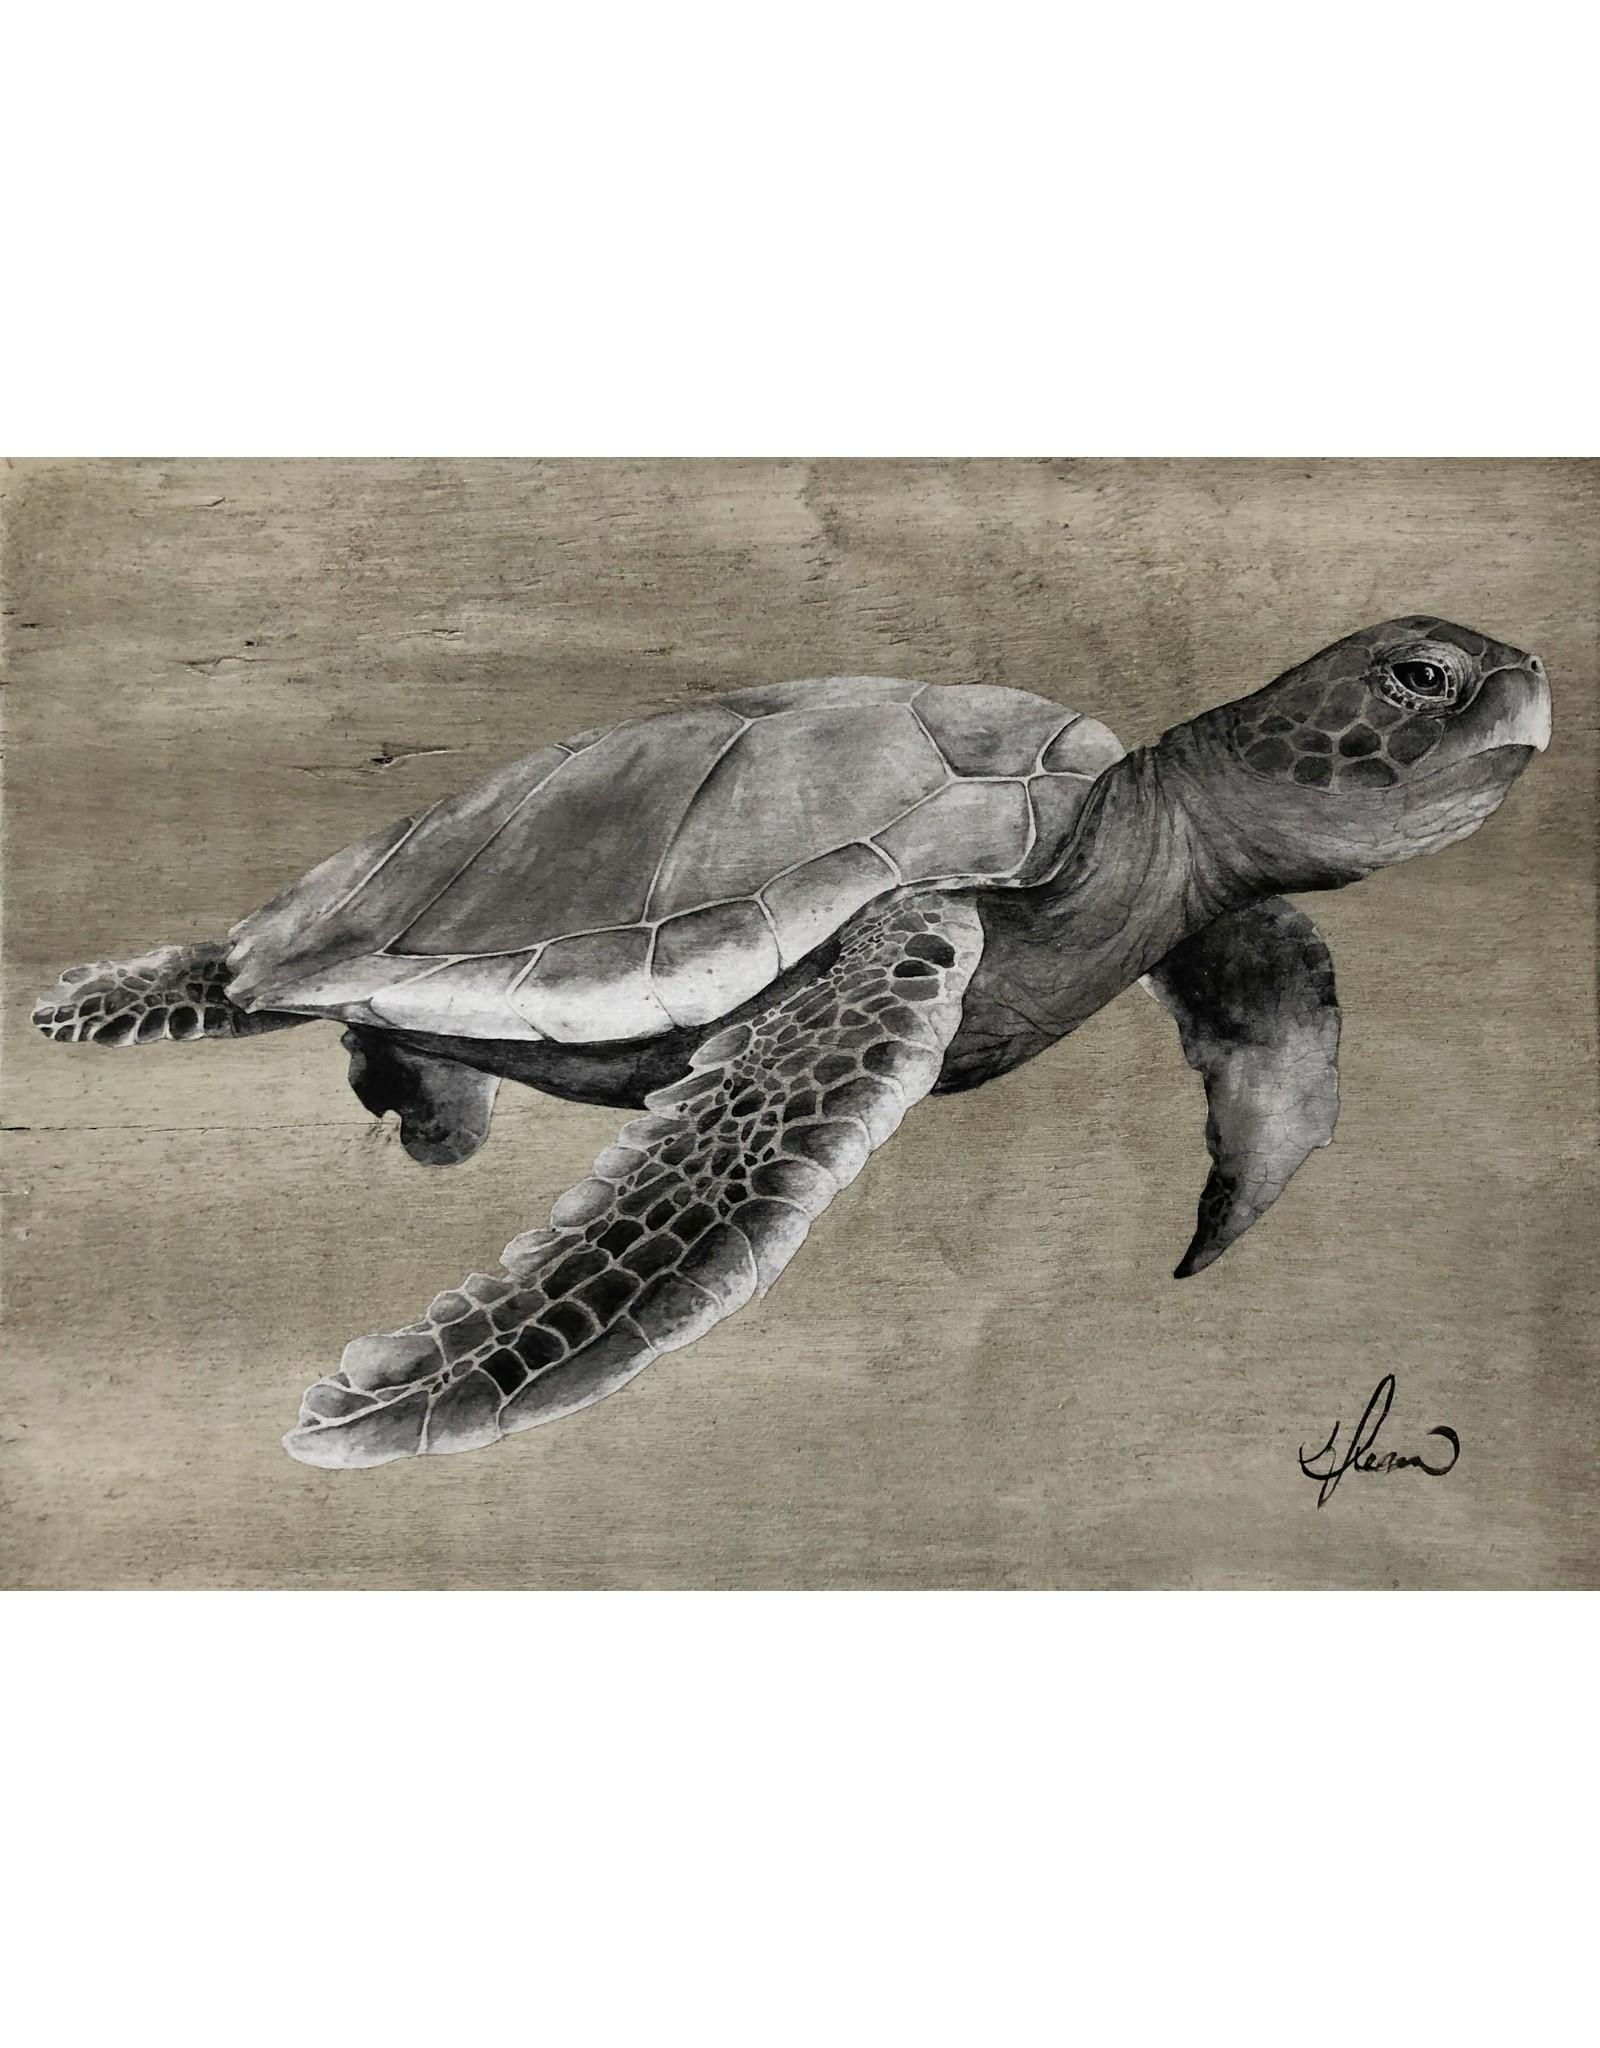 "Molly Pearce Loggerhead Turtle (gray) 17x24"""" MOLP)"